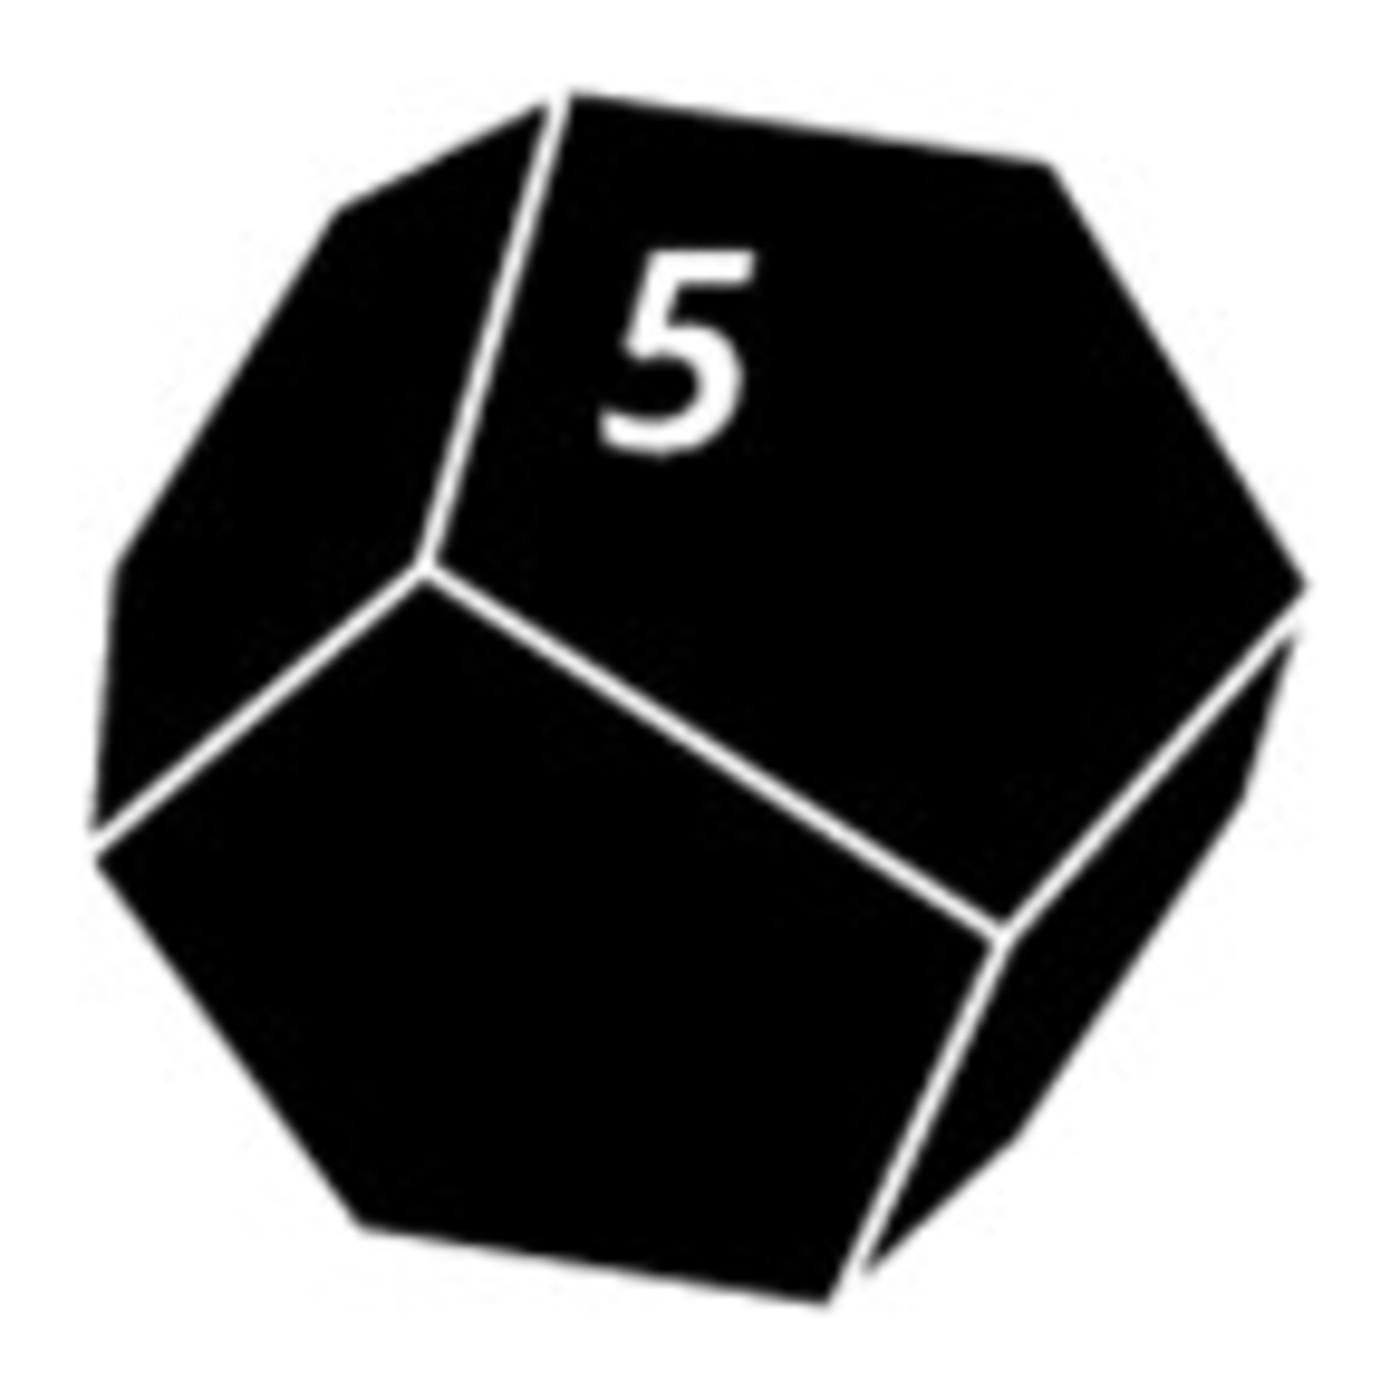 Pieci - 5 Koncerti